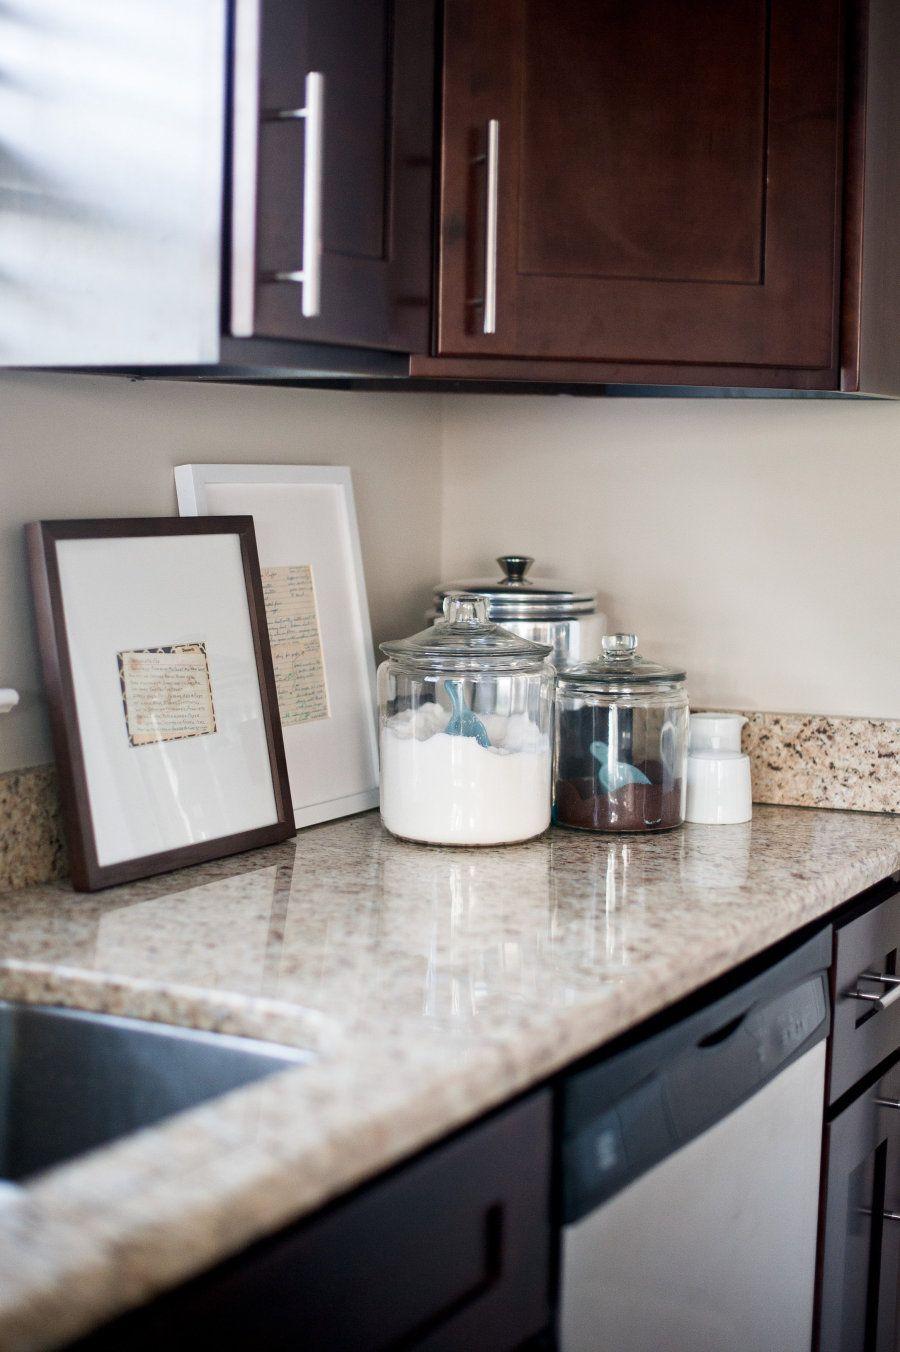 Diy playbookus home tour from gina cristine handwriting kitchens